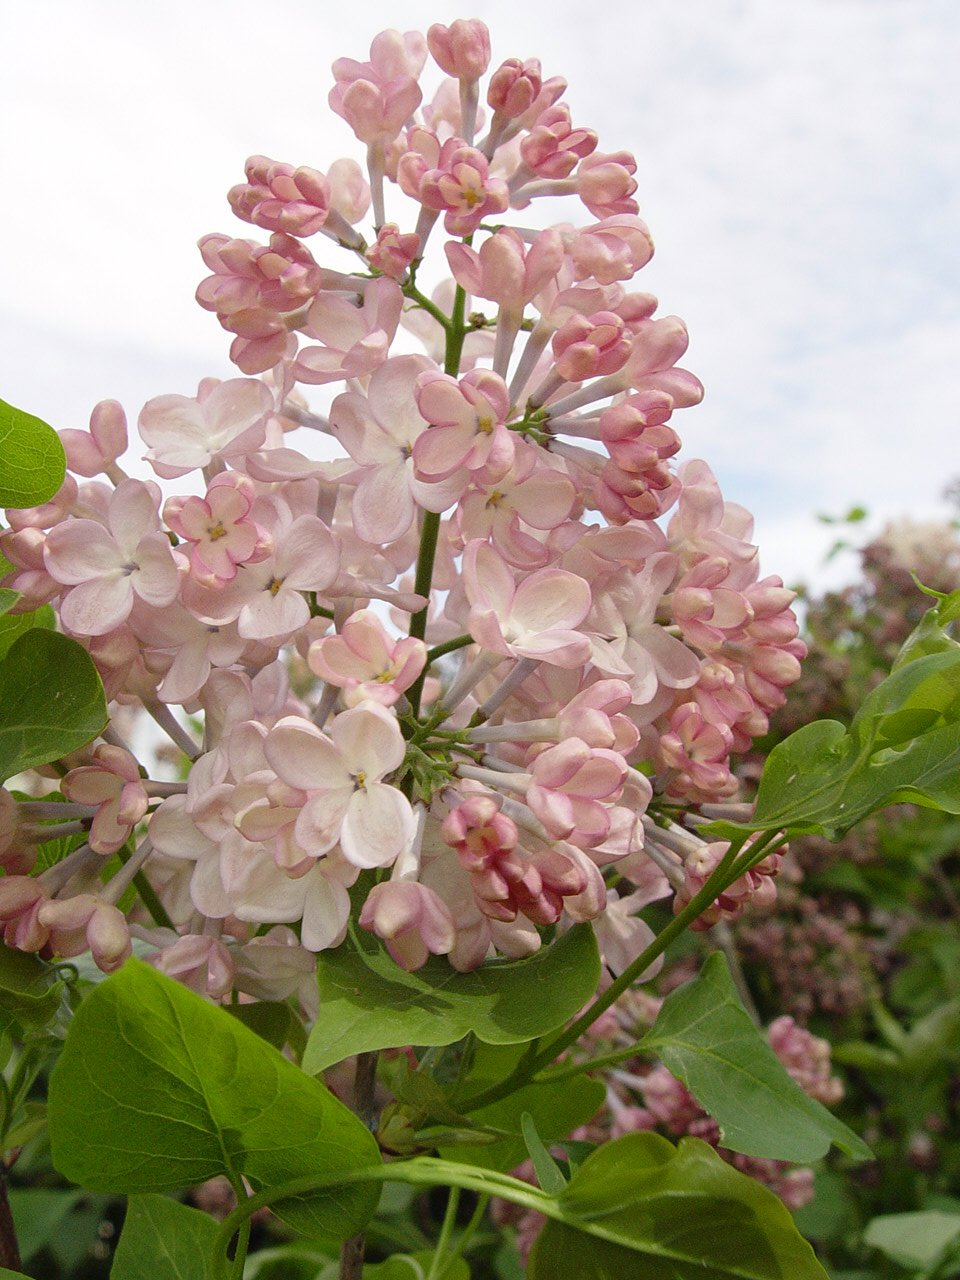 Syringa X hya. 'Maiden's Blush' (Lilac) Shrub, Light Pink Flowers, 3 - Size Container